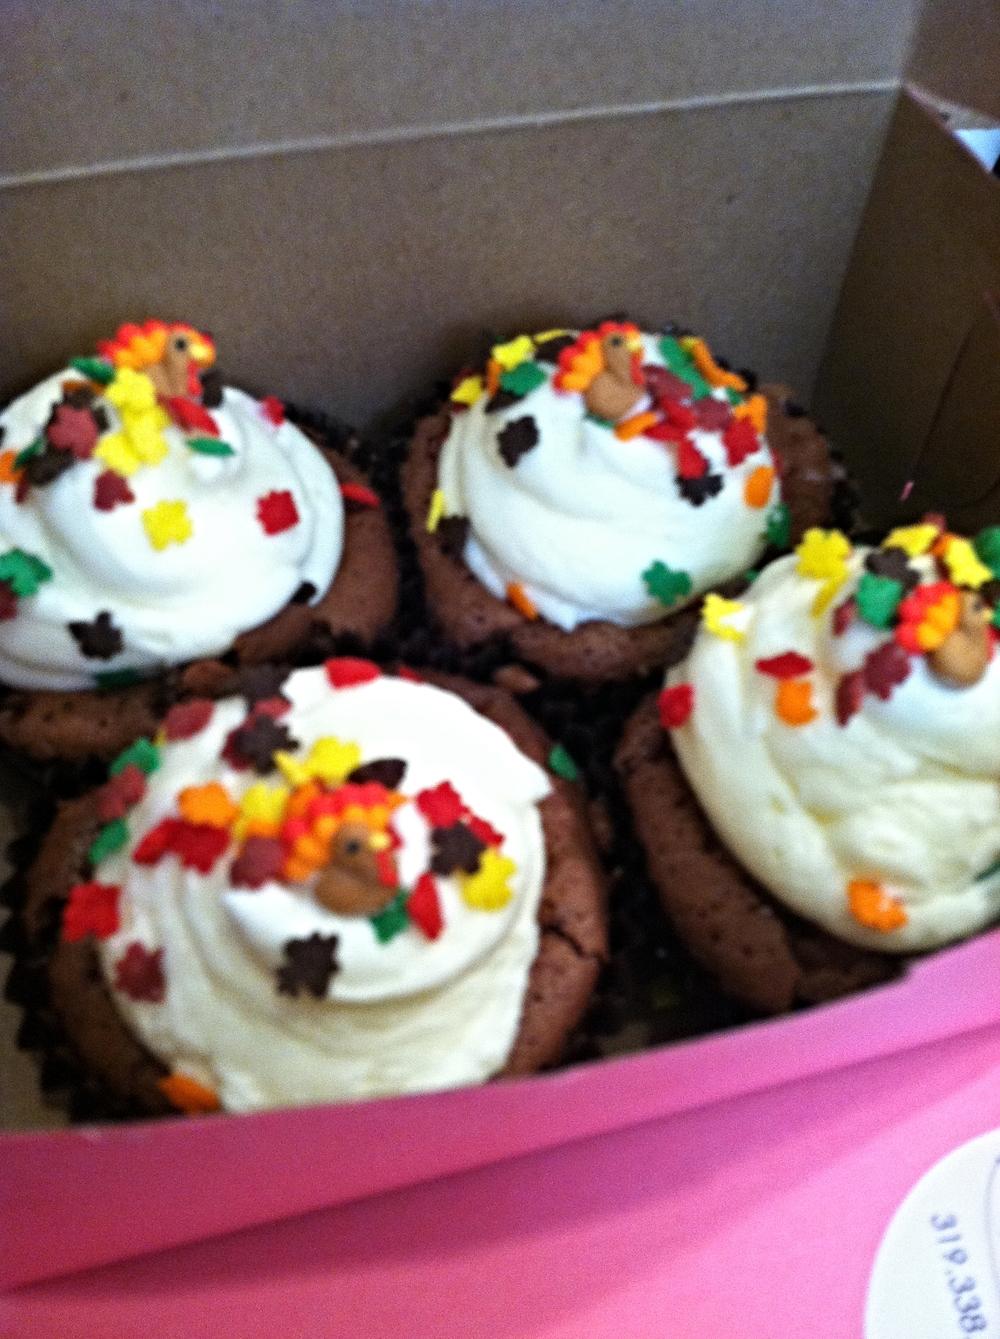 JennySingleton from Umbrella Salon in San Jose, CA sends cupcakes to Buzz Salon, Iowa City, IA to say thank you!